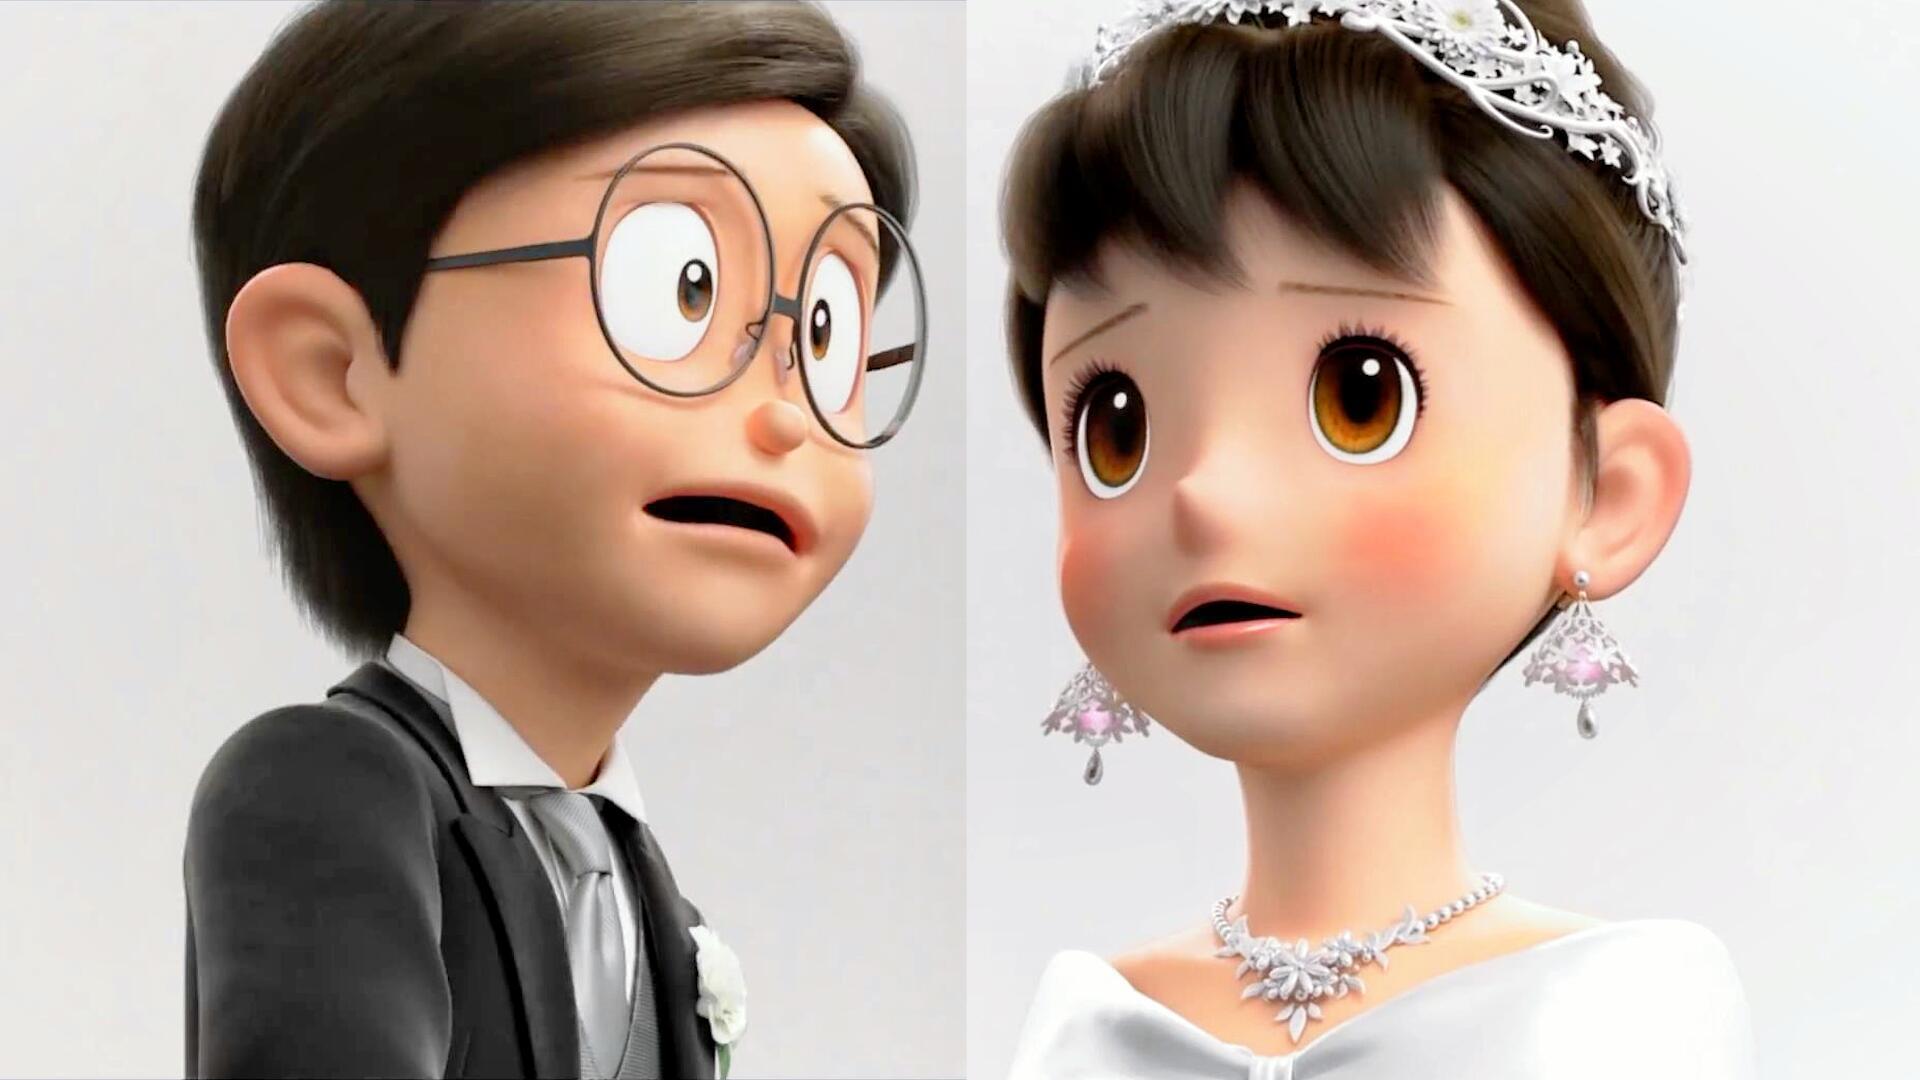 【3D电影50周年纪念】哆啦A梦:伴我同行2 正式PV【MCE汉化组】